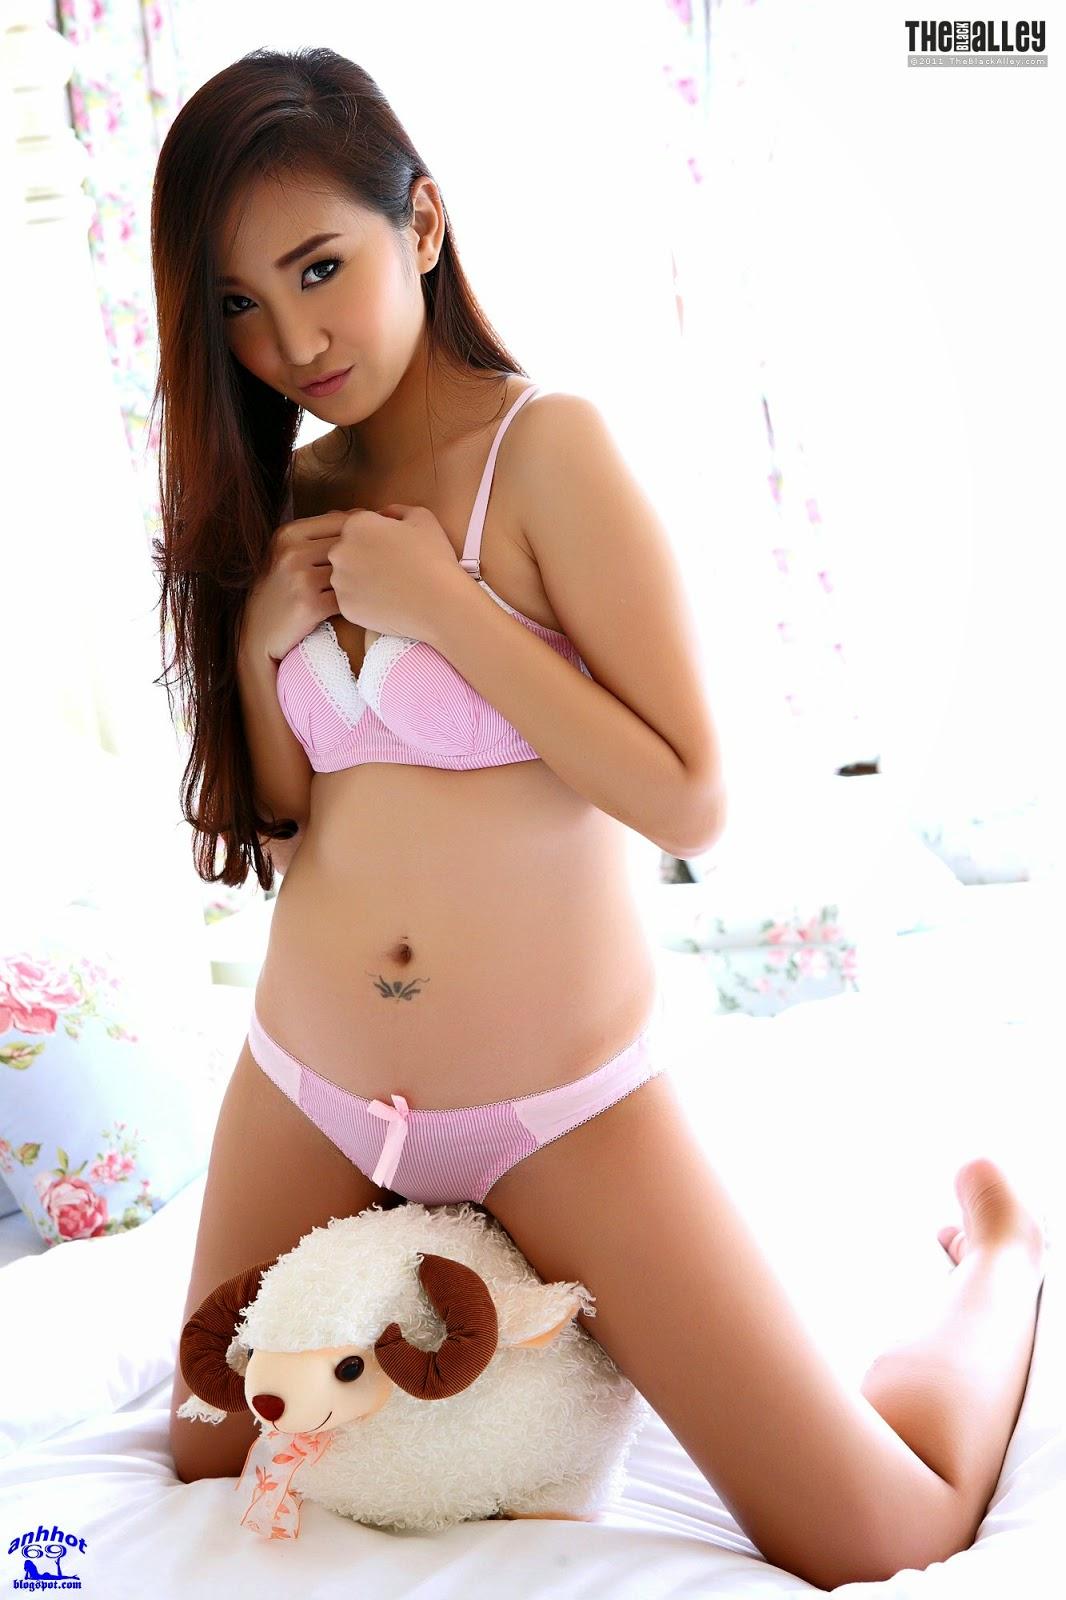 lolita-cheng-64-042